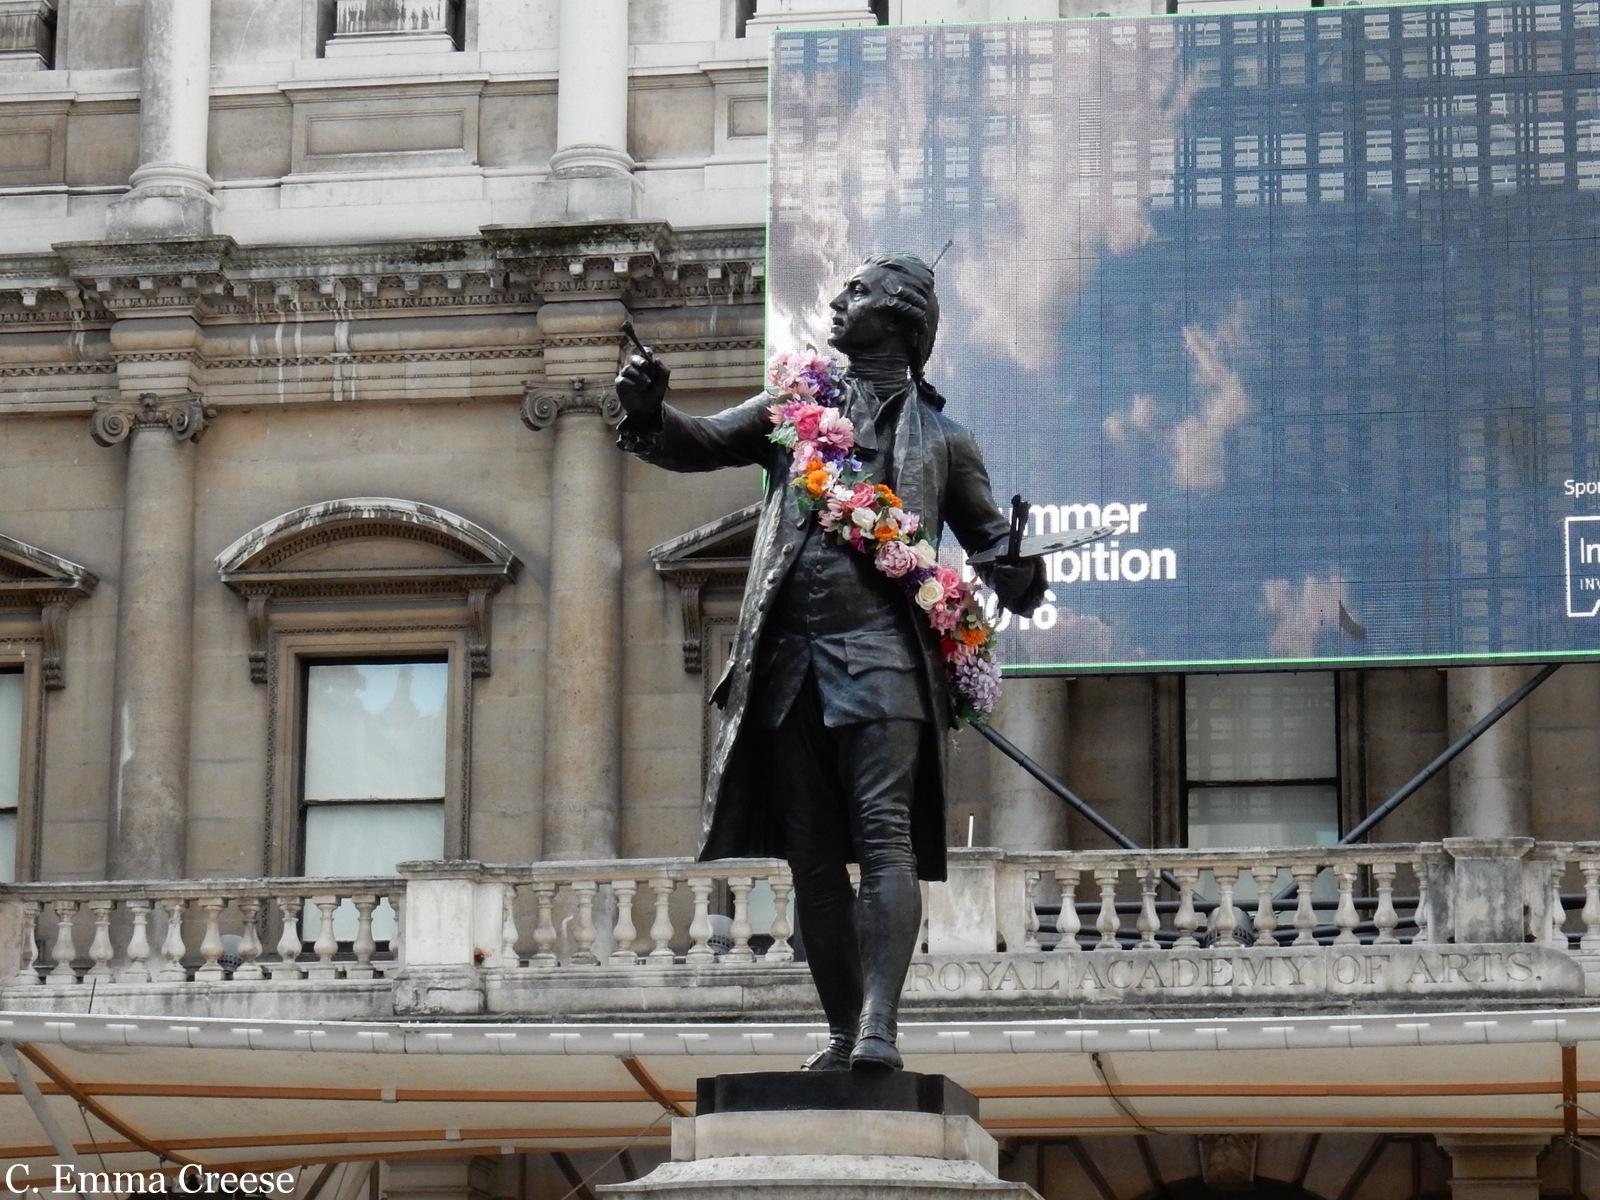 Latest Adventures of a London Kiwi: Modern Art Royal Academy